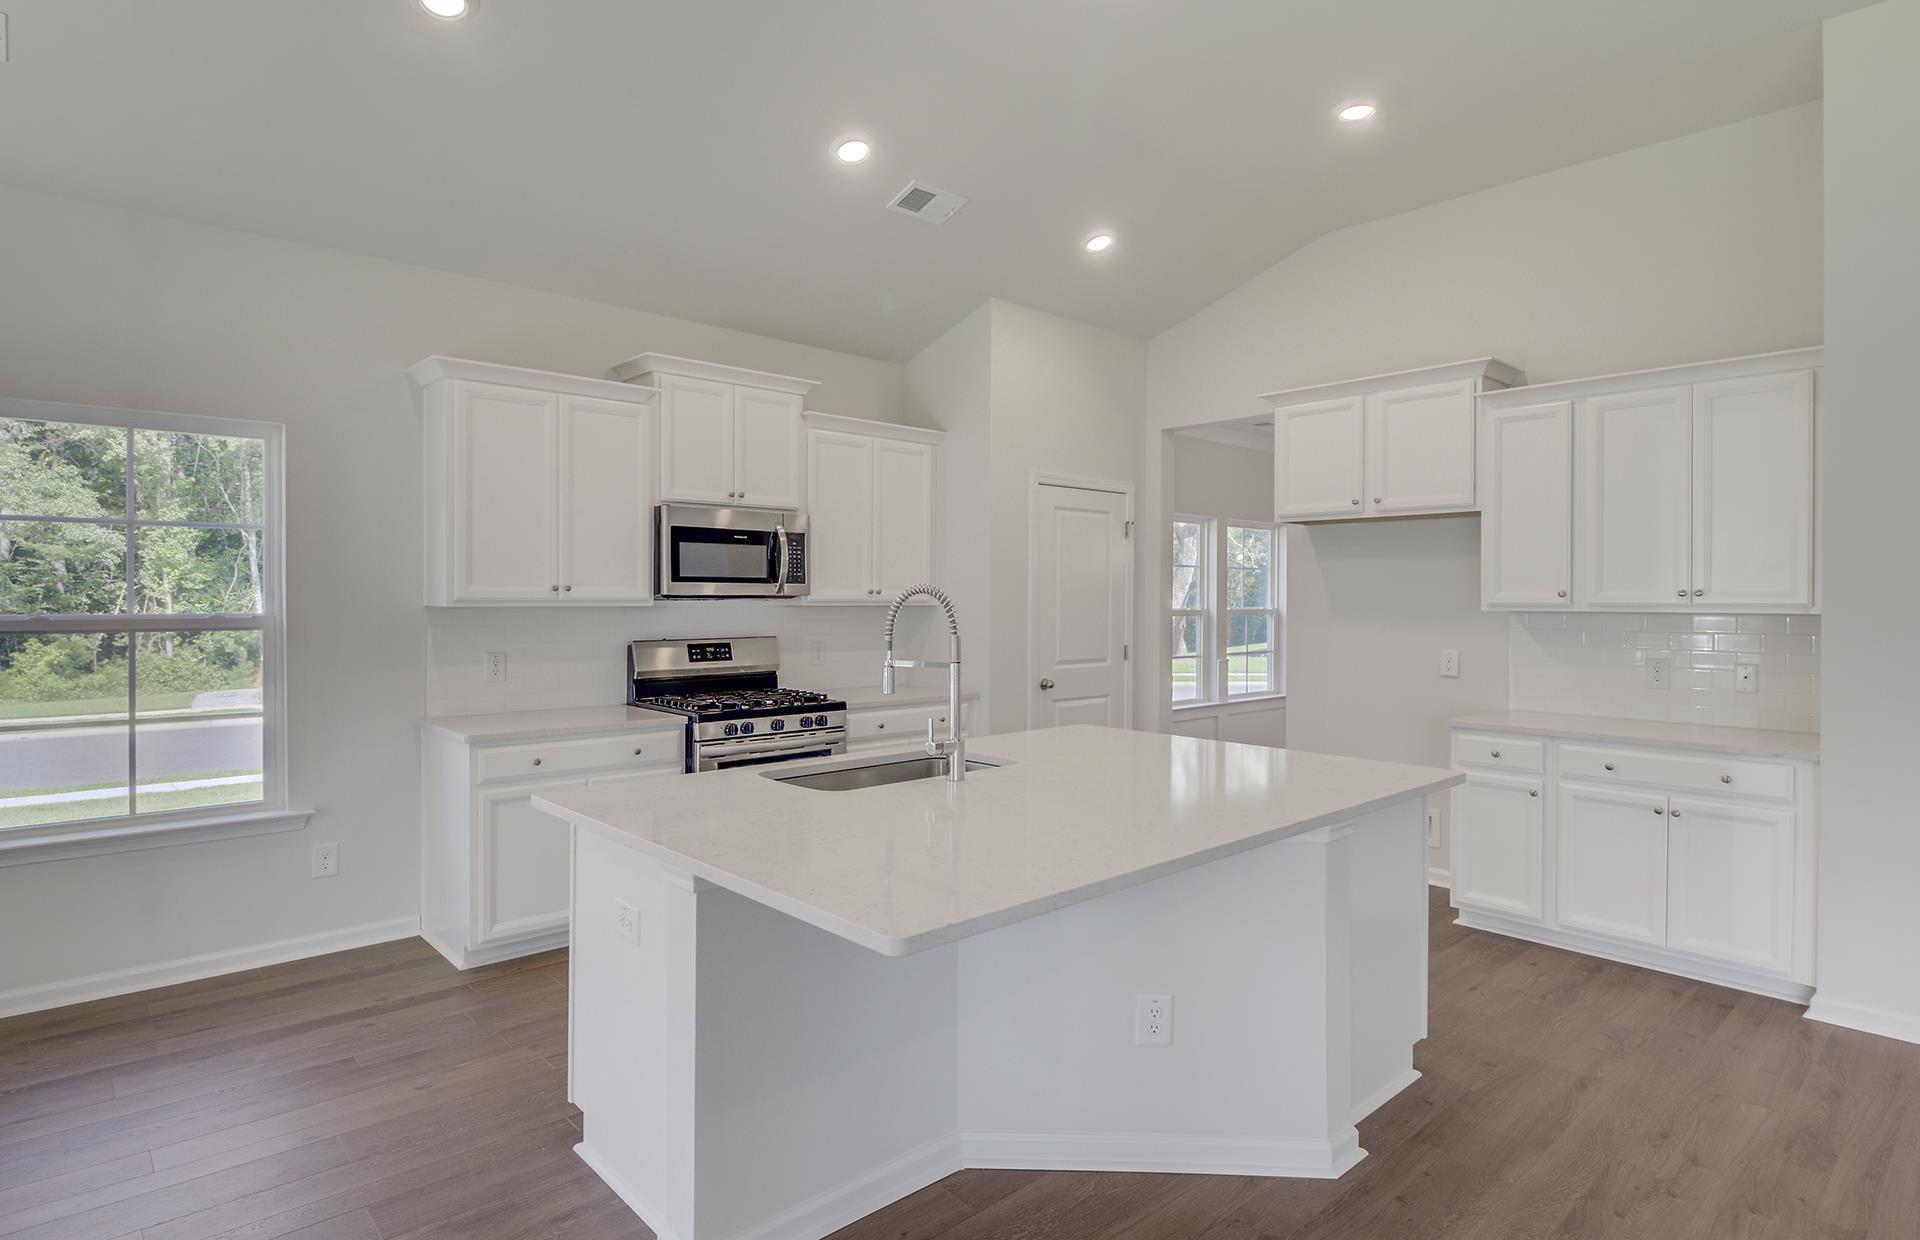 Cane Bay Plantation Homes For Sale - 205 Granton Edge, Summerville, SC - 0